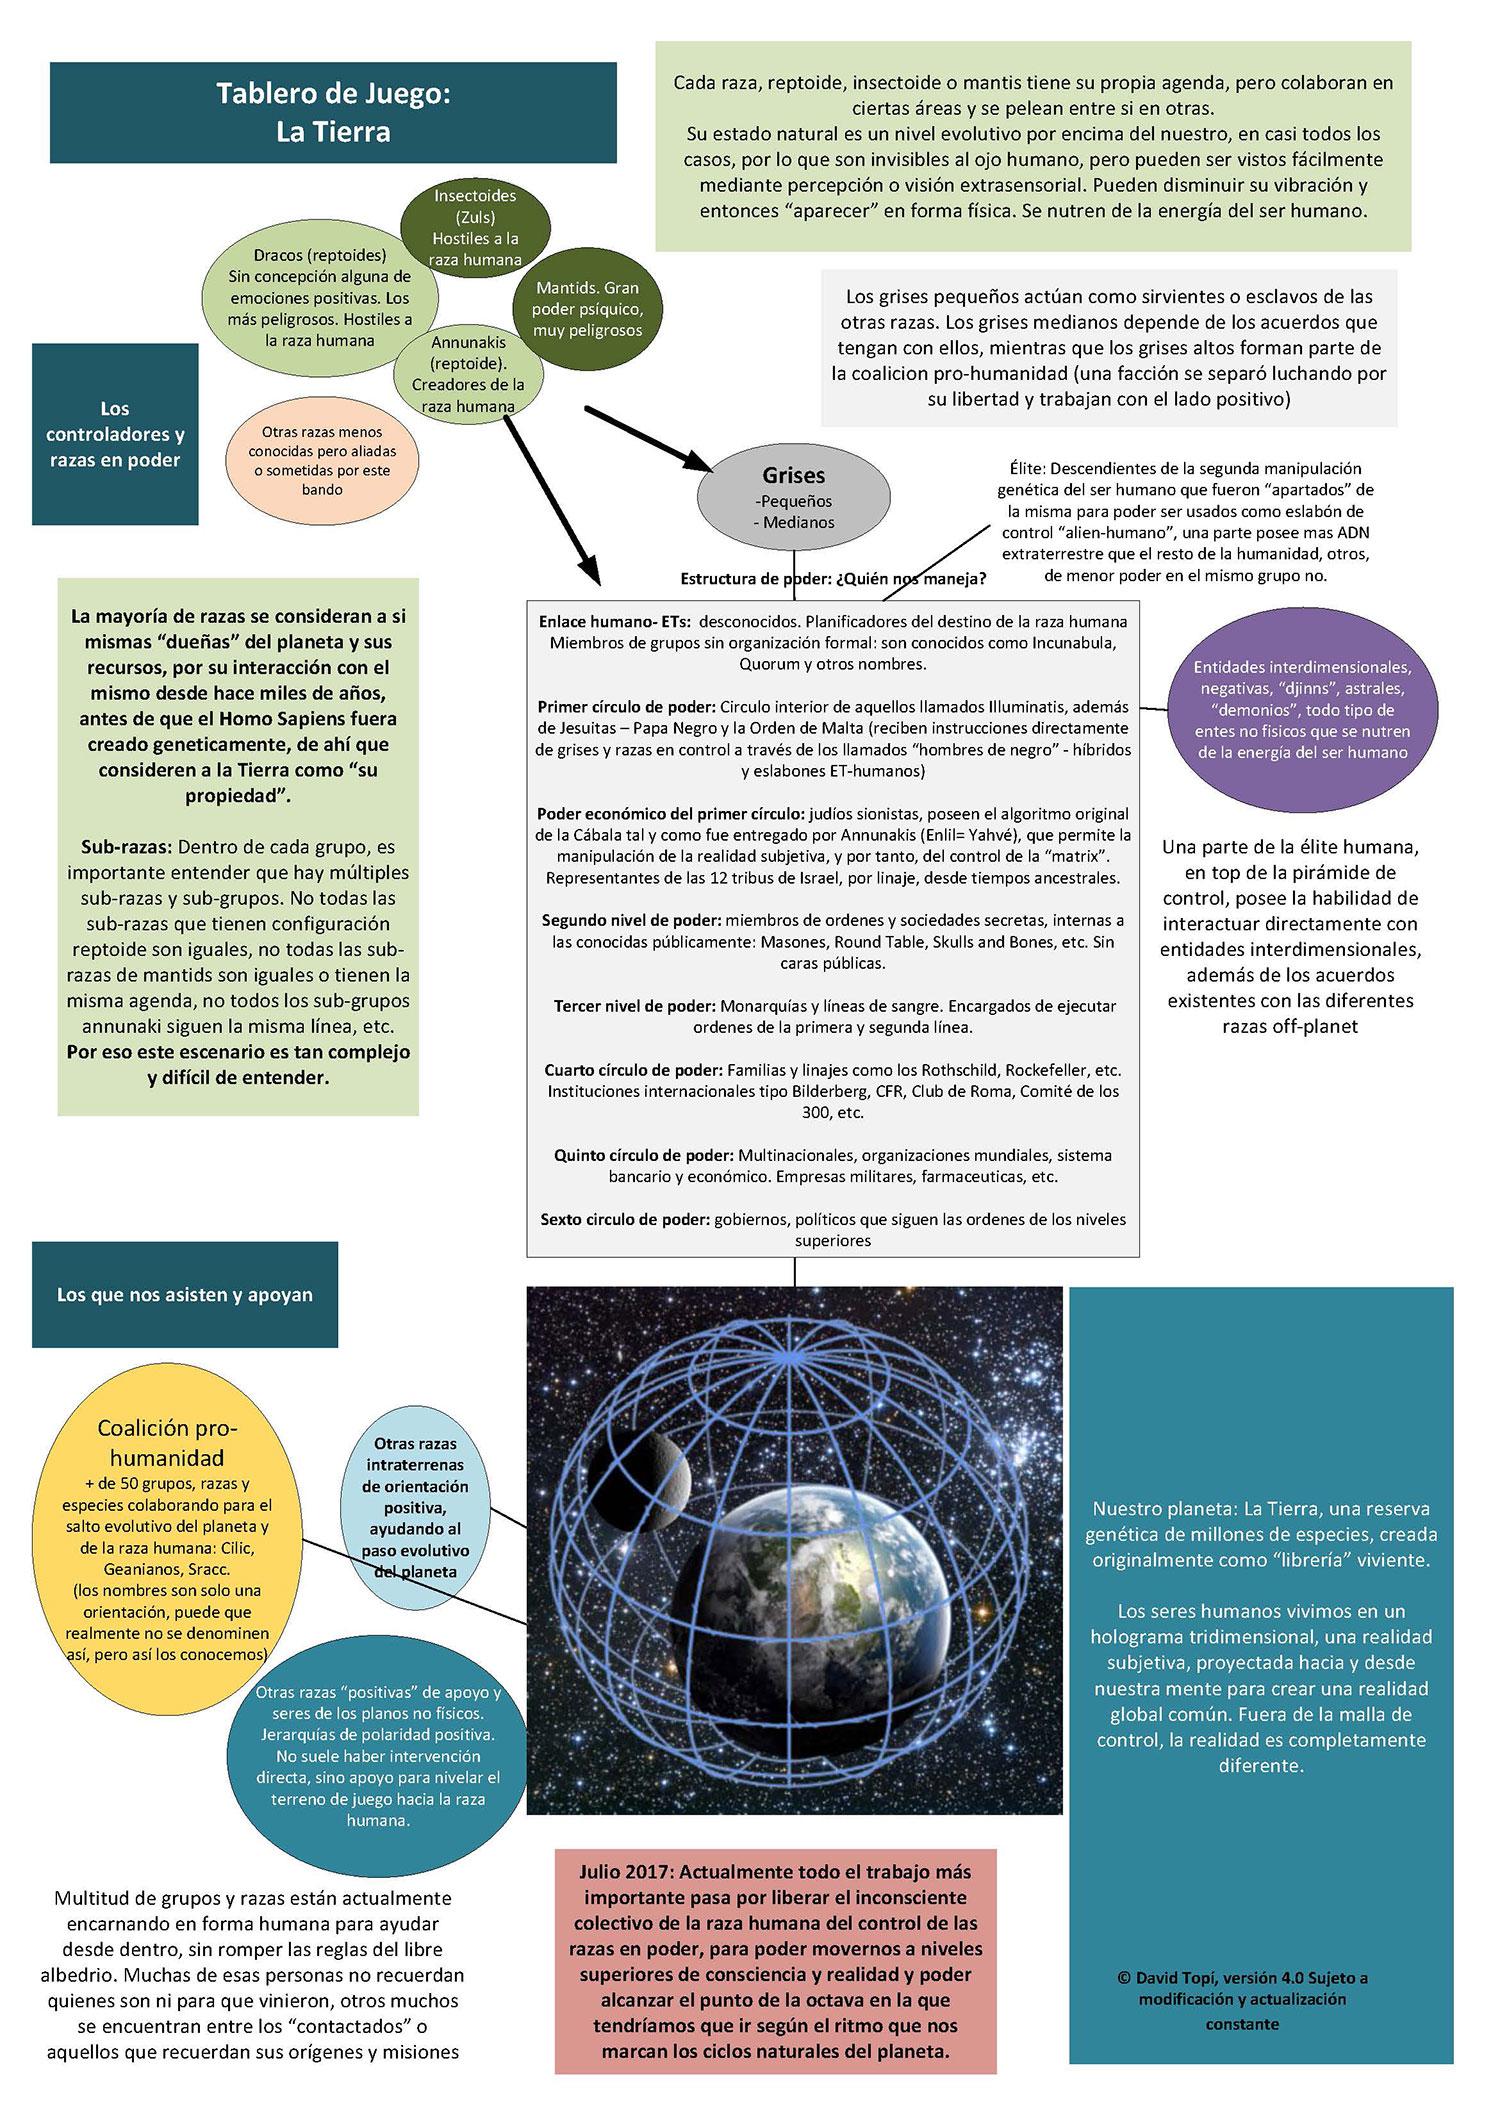 https://www.bibliotecapleyades.net/imagenes_ciencia2/conscioushumanenergy280_01.jpg